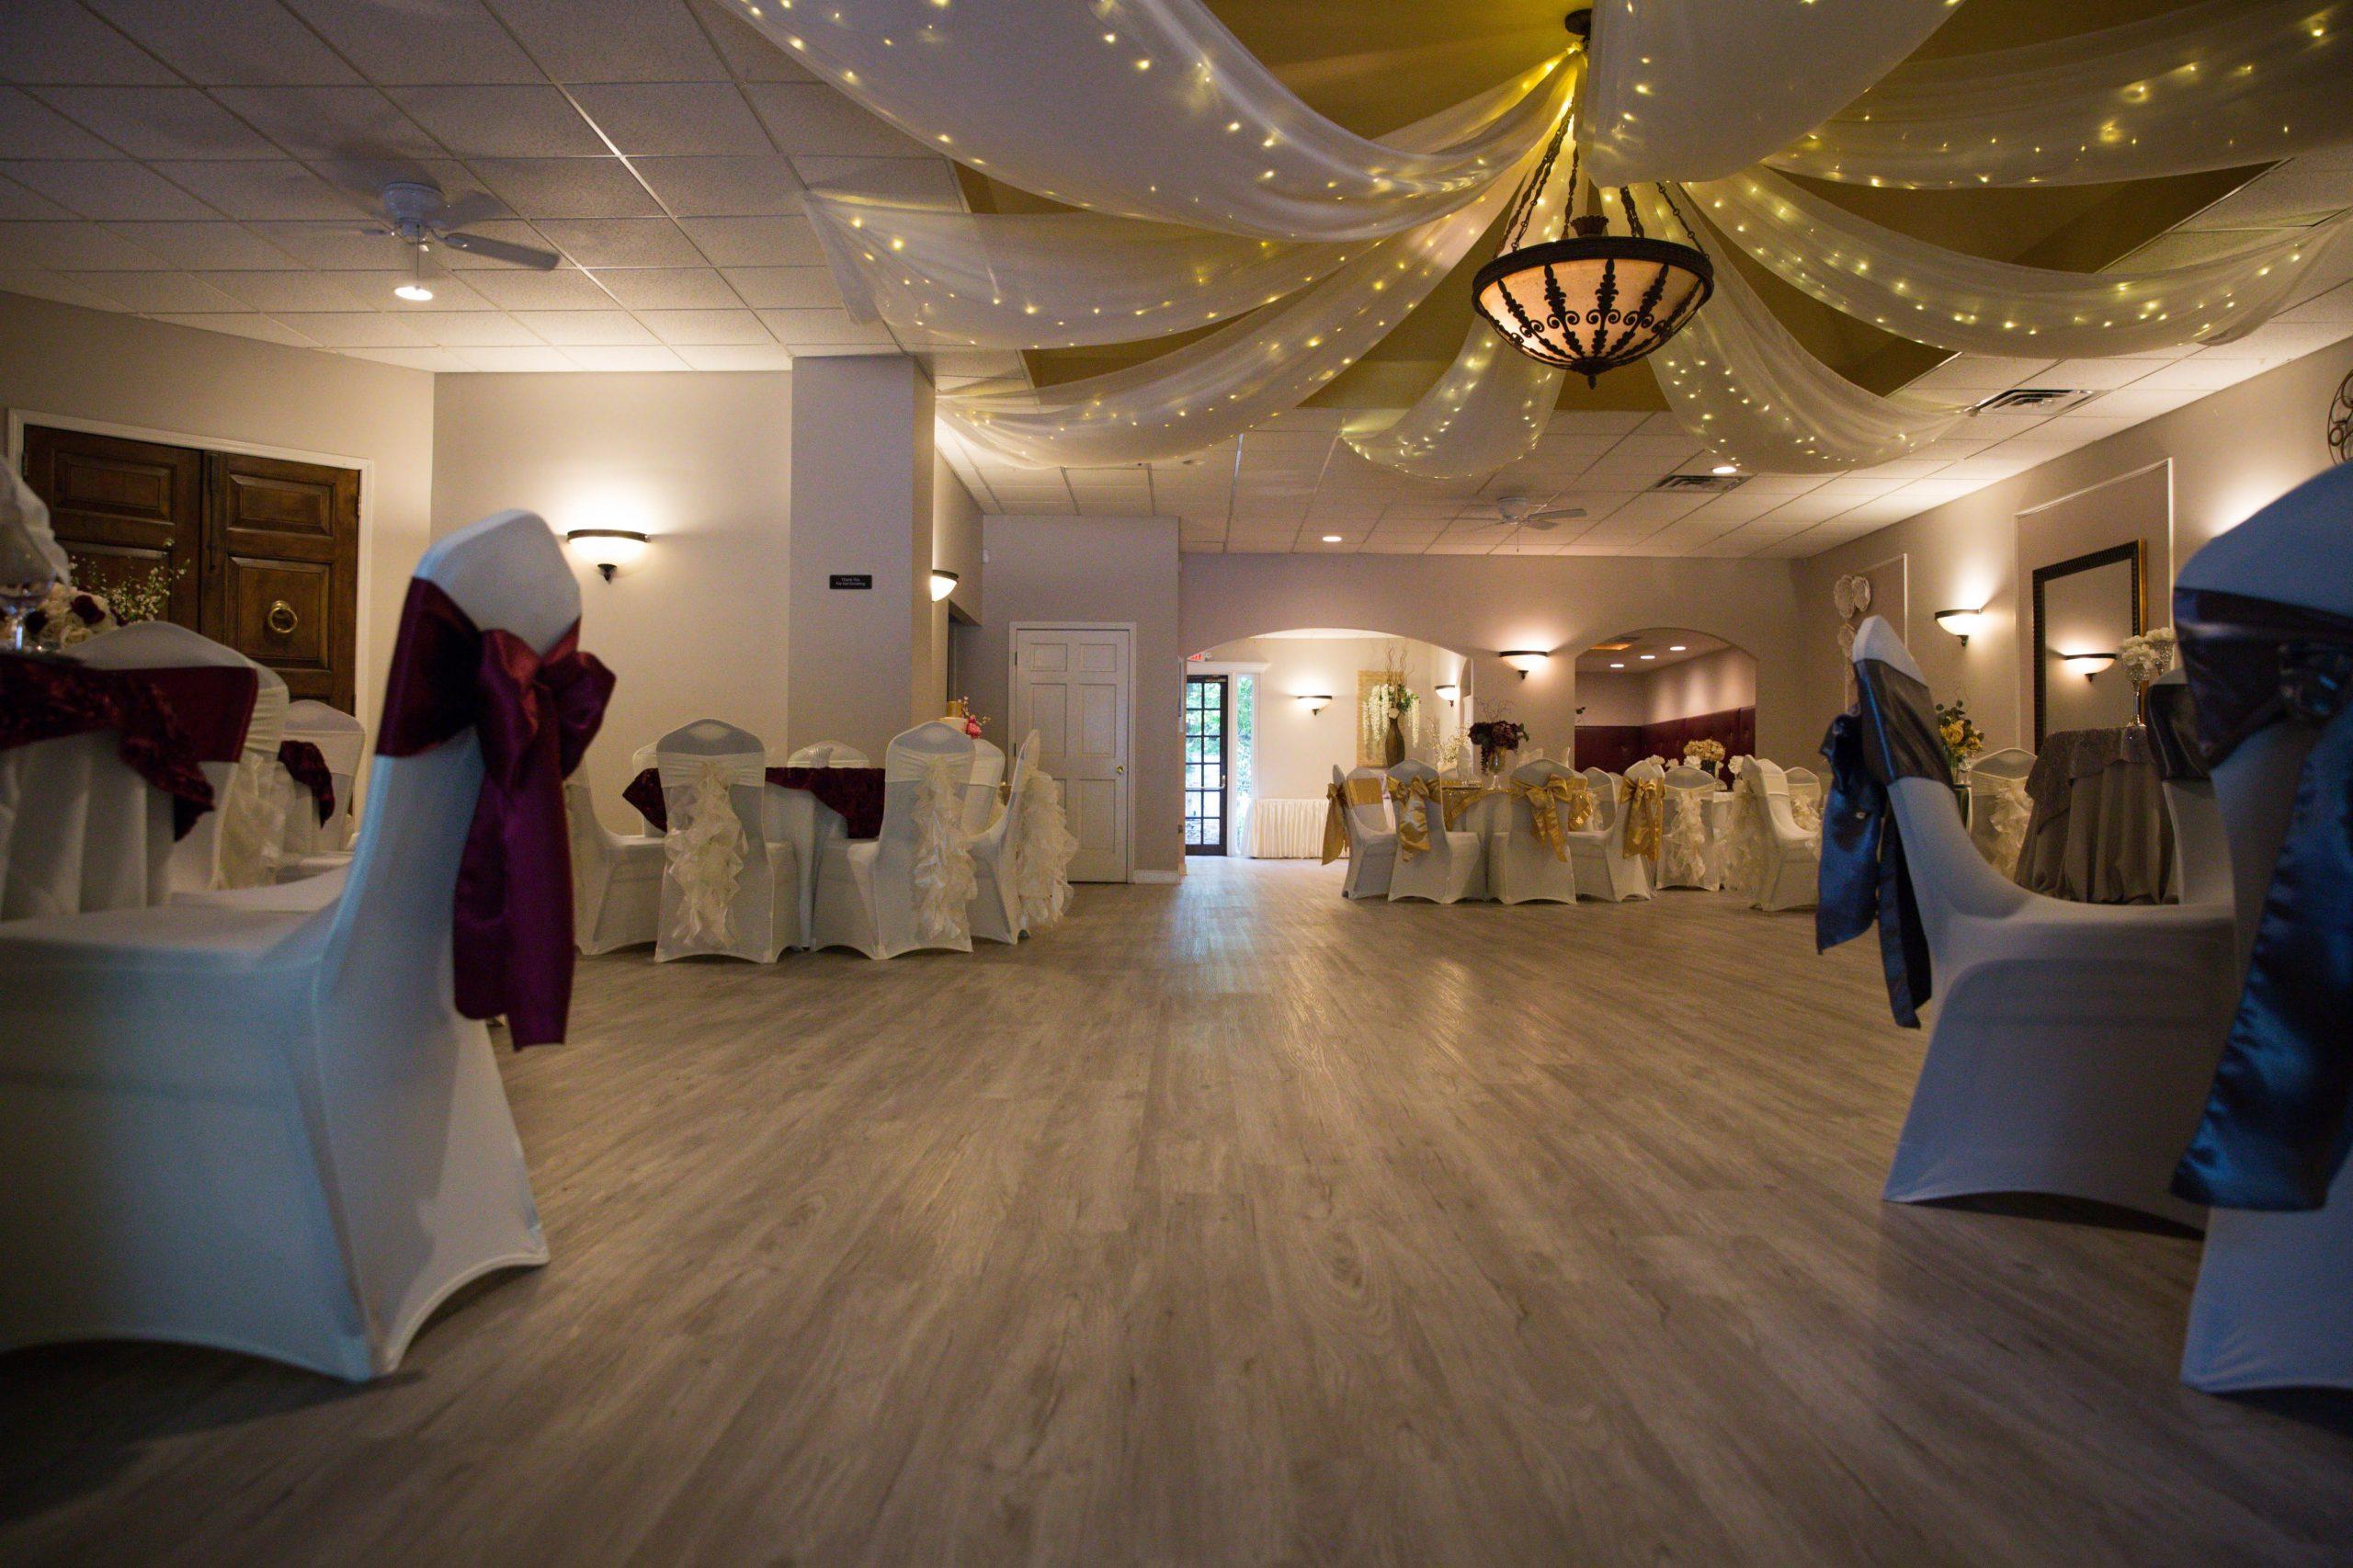 wedding reception venue in Marietta, GA